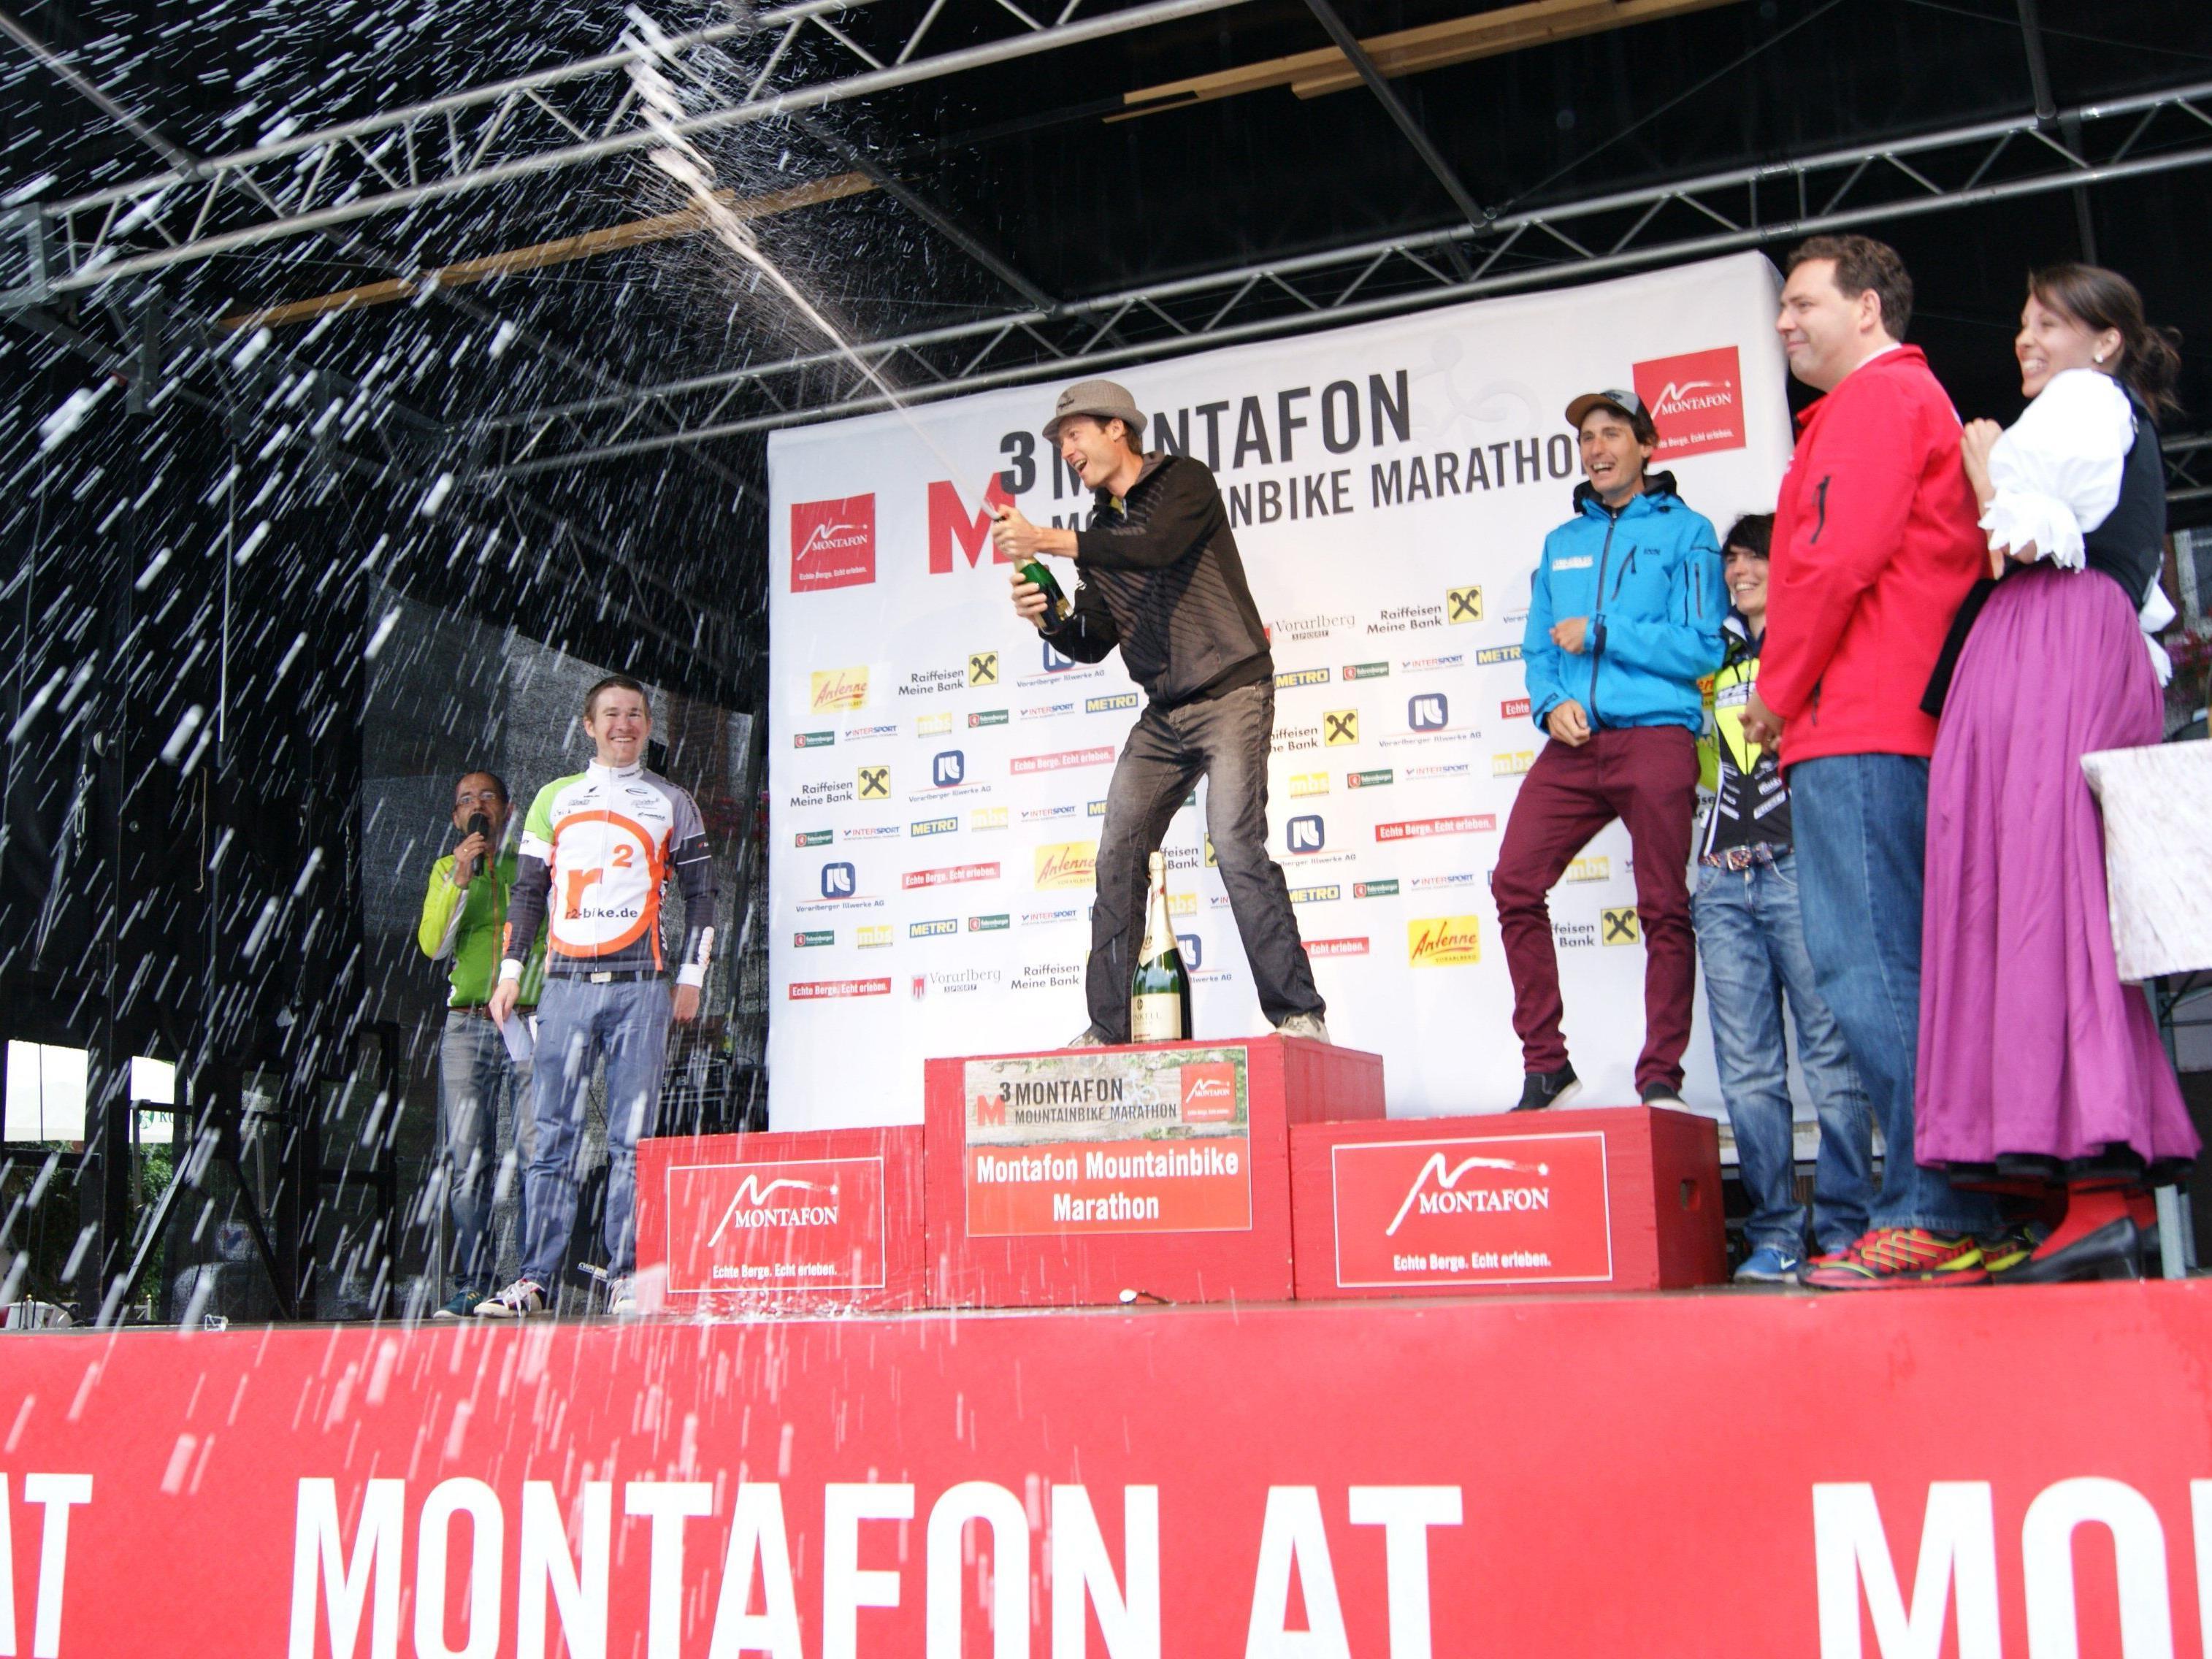 Preisverleihung - M3 Montafon MTB Marathon.